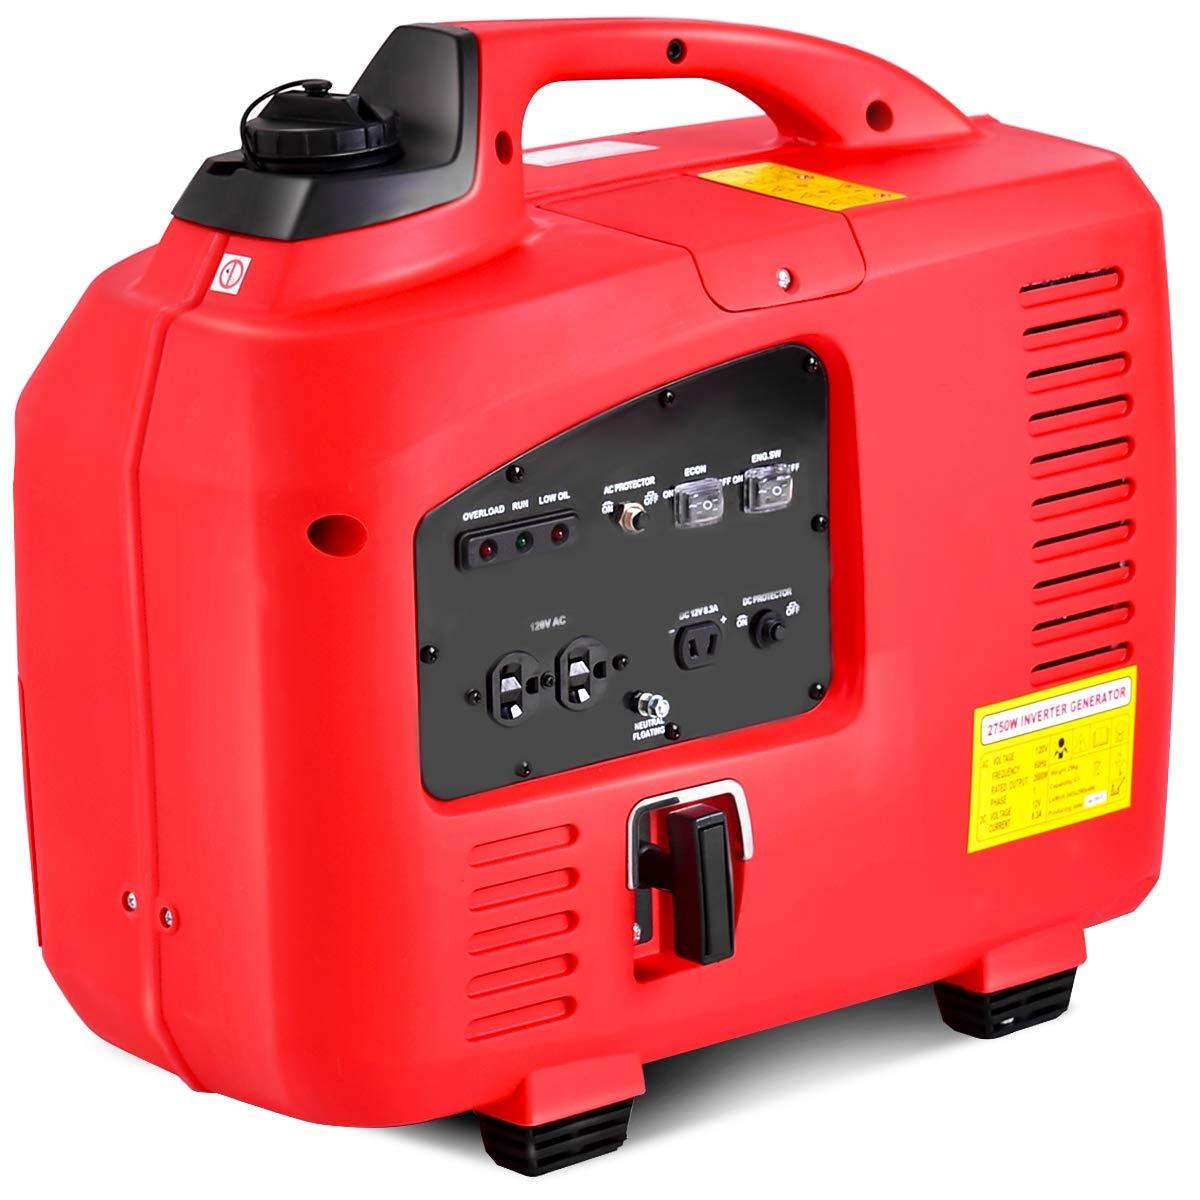 1250W Digital Inverter Generator 4 Stroke 53CC